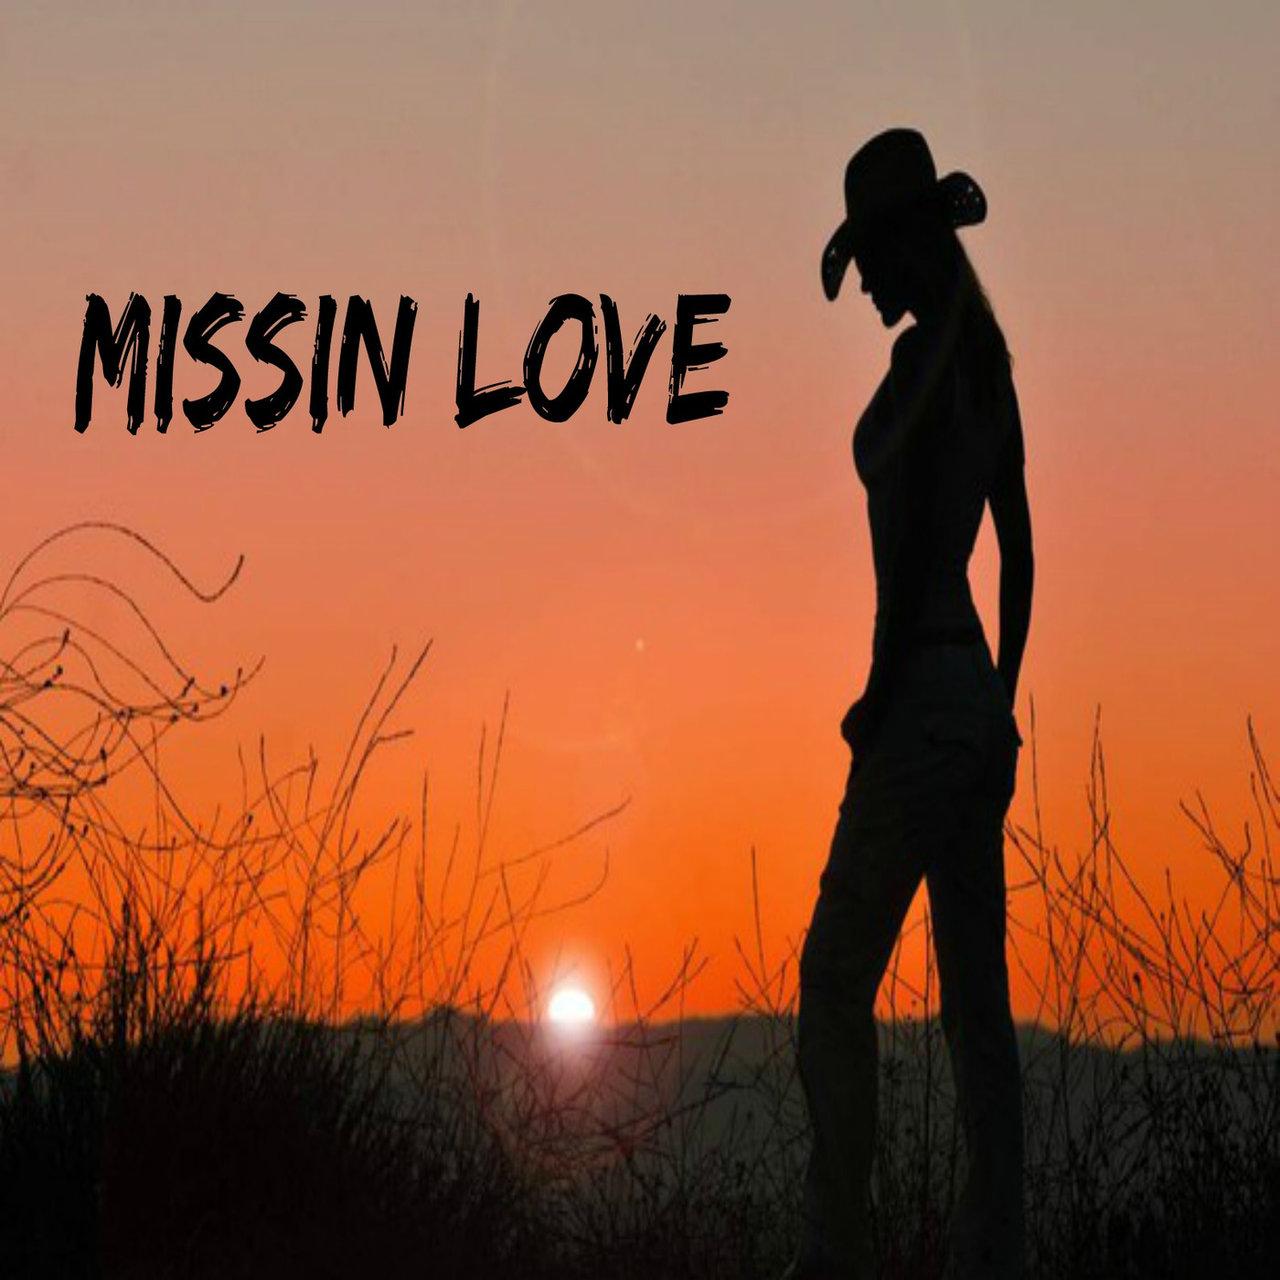 Gabby Barrett - Missin Love